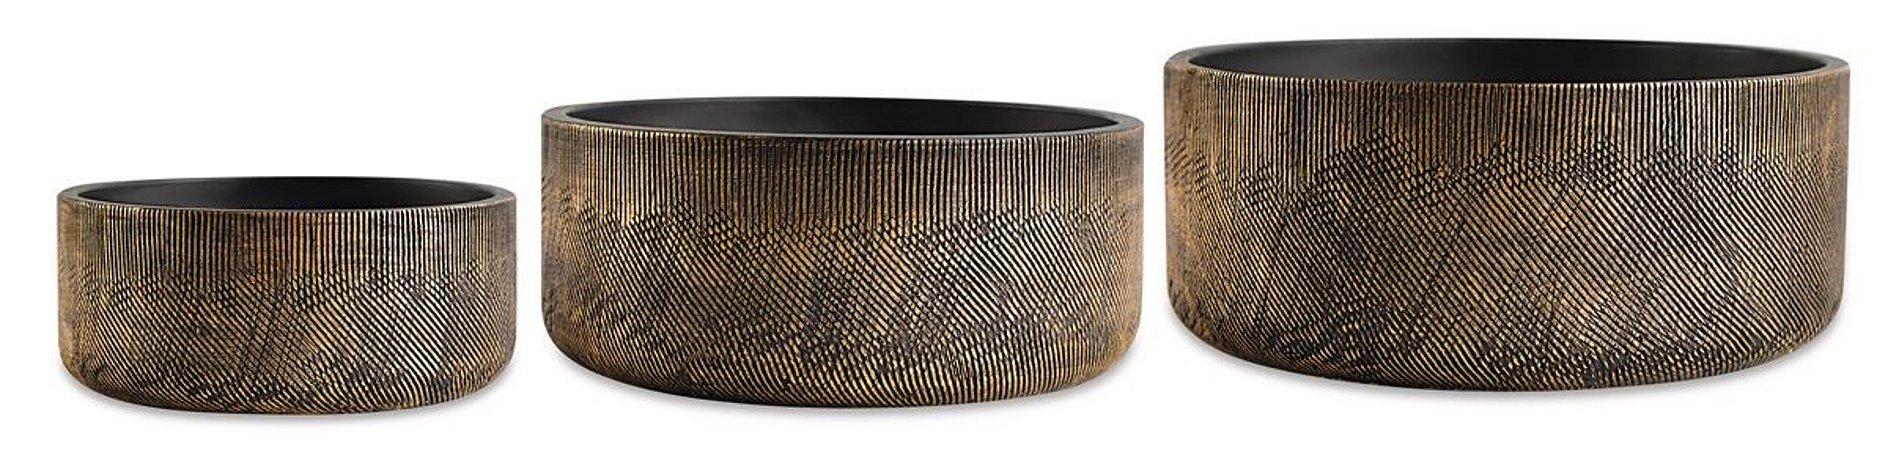 Kit Cachepot Cimento Preto e Dourado Mart